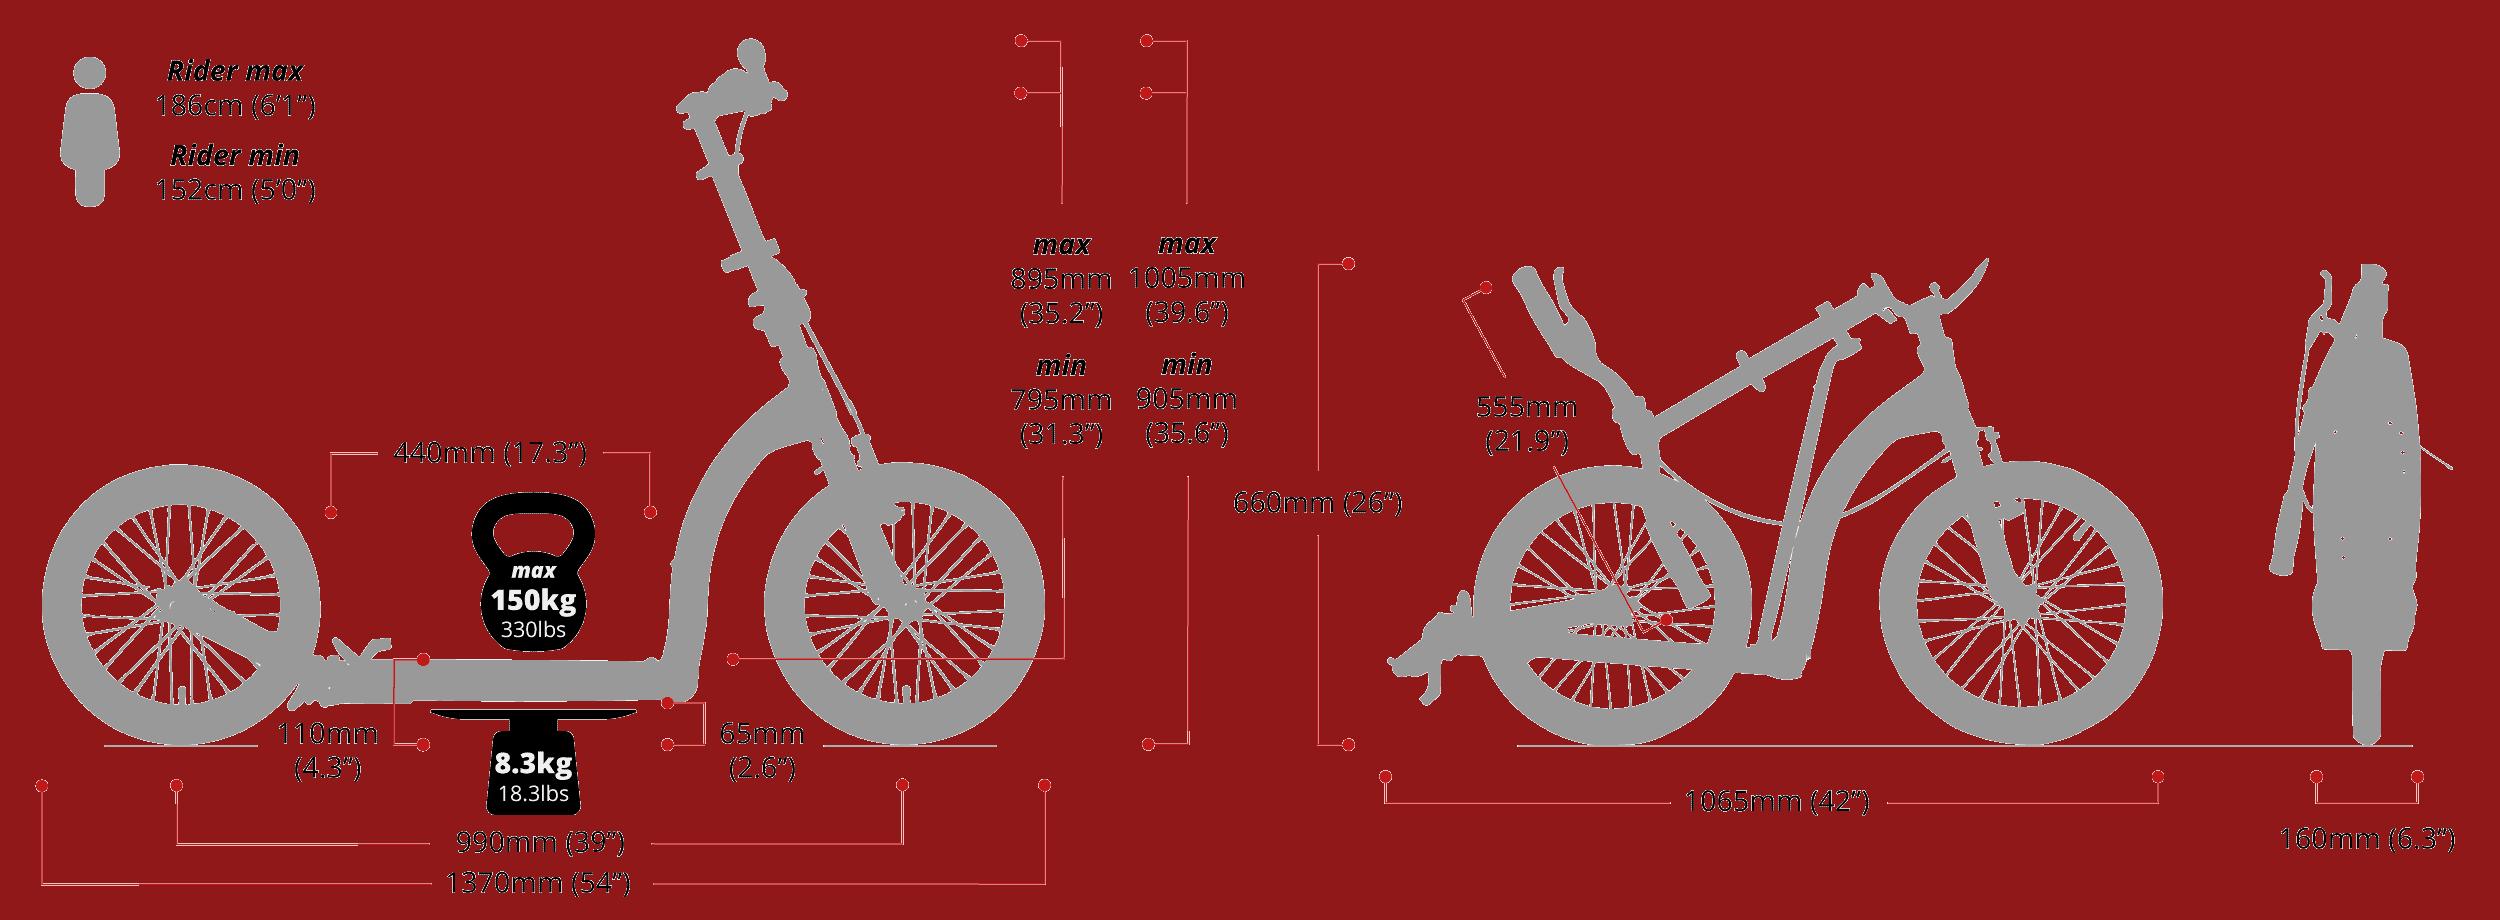 swifty-ONE-Maße-länge-Größe